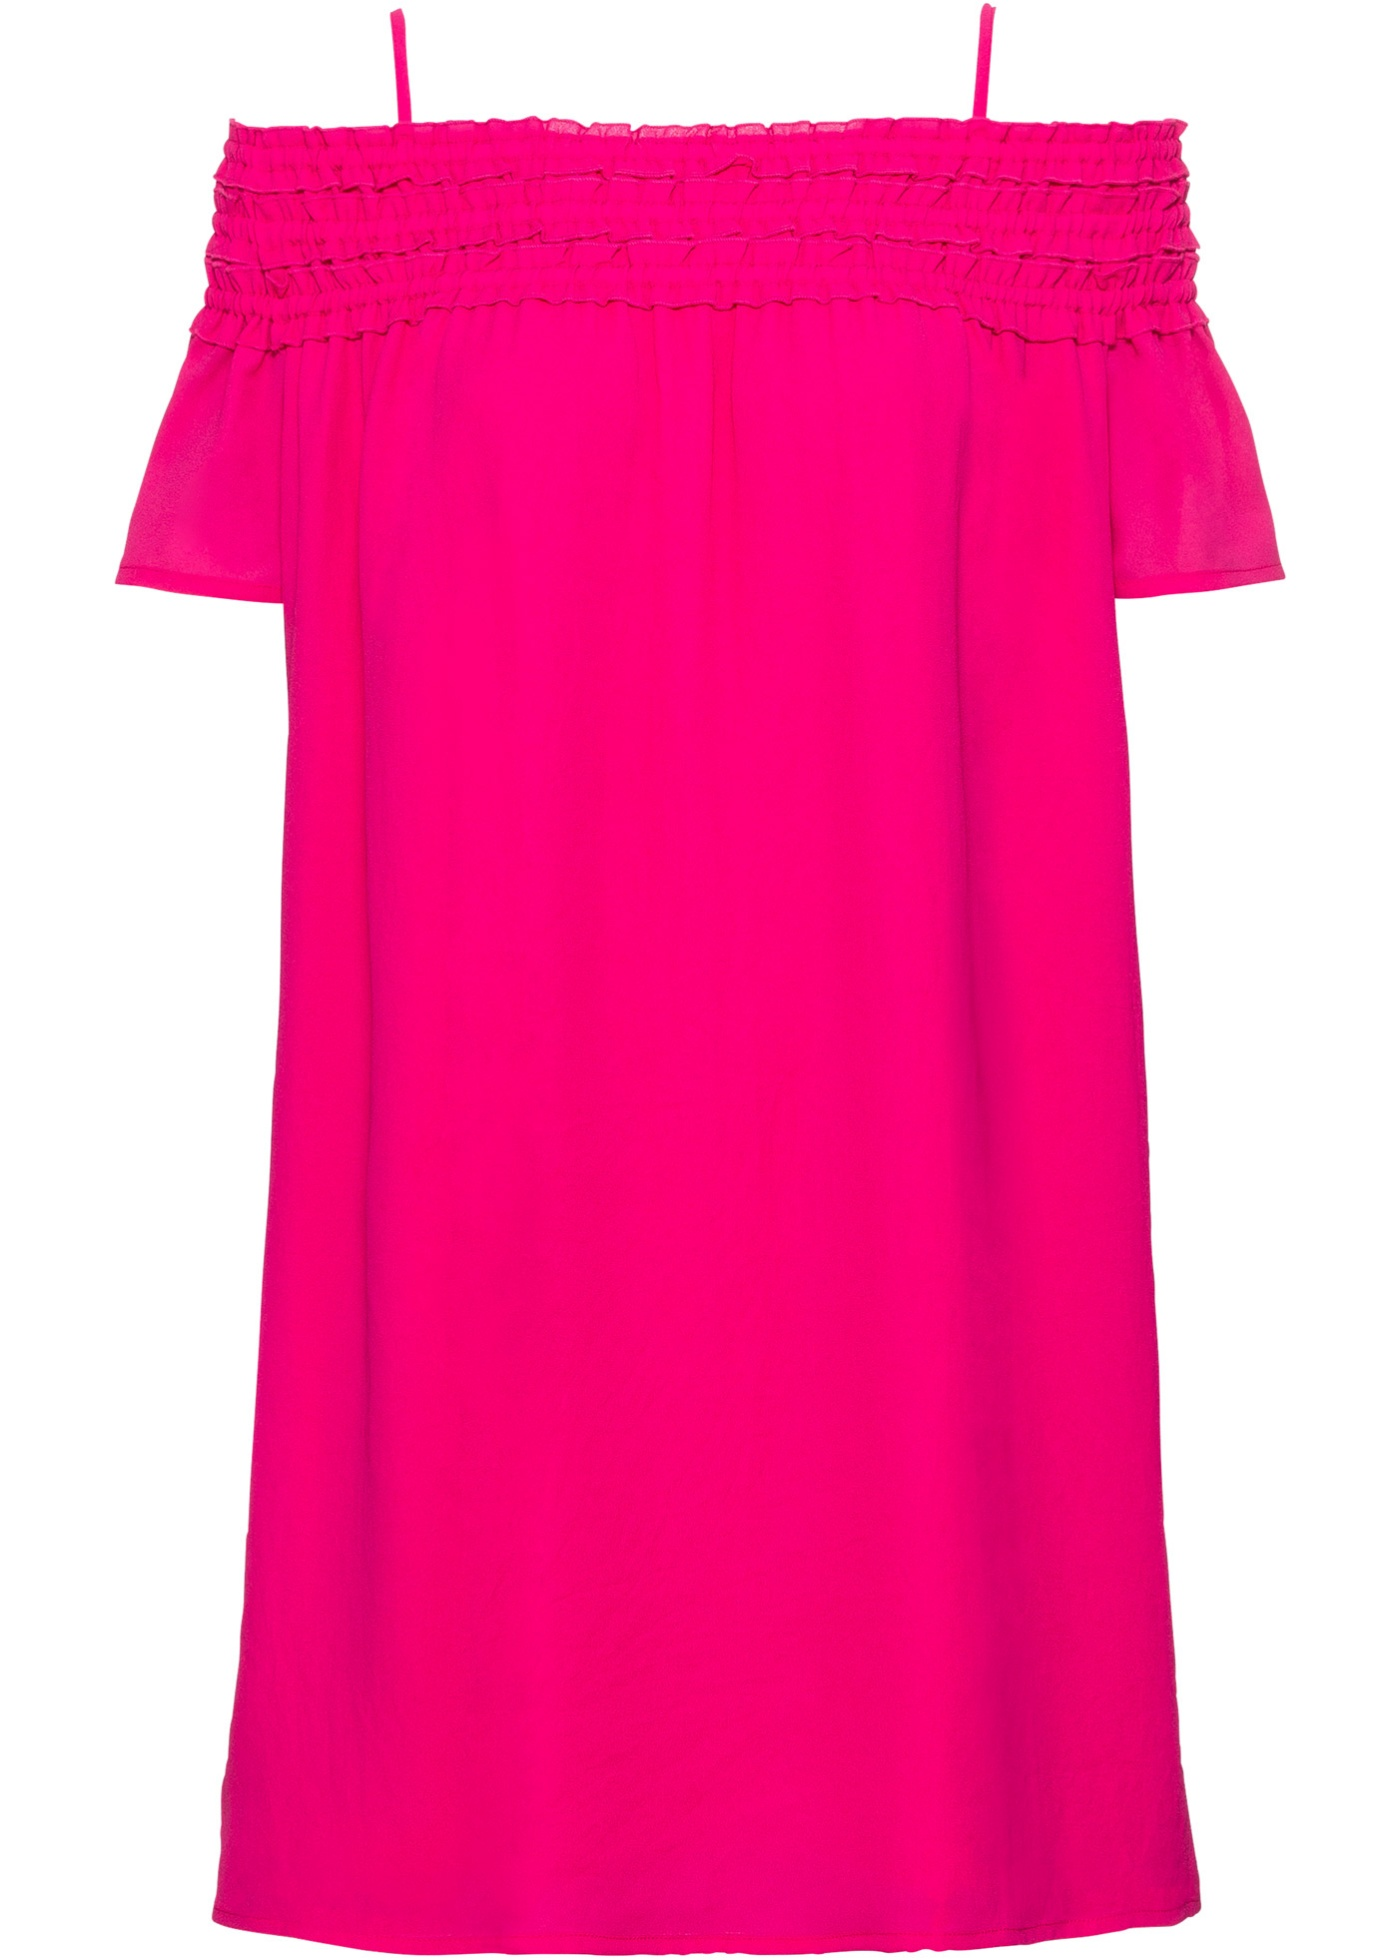 Robe à encolure style Carmen : MUST-HAVE